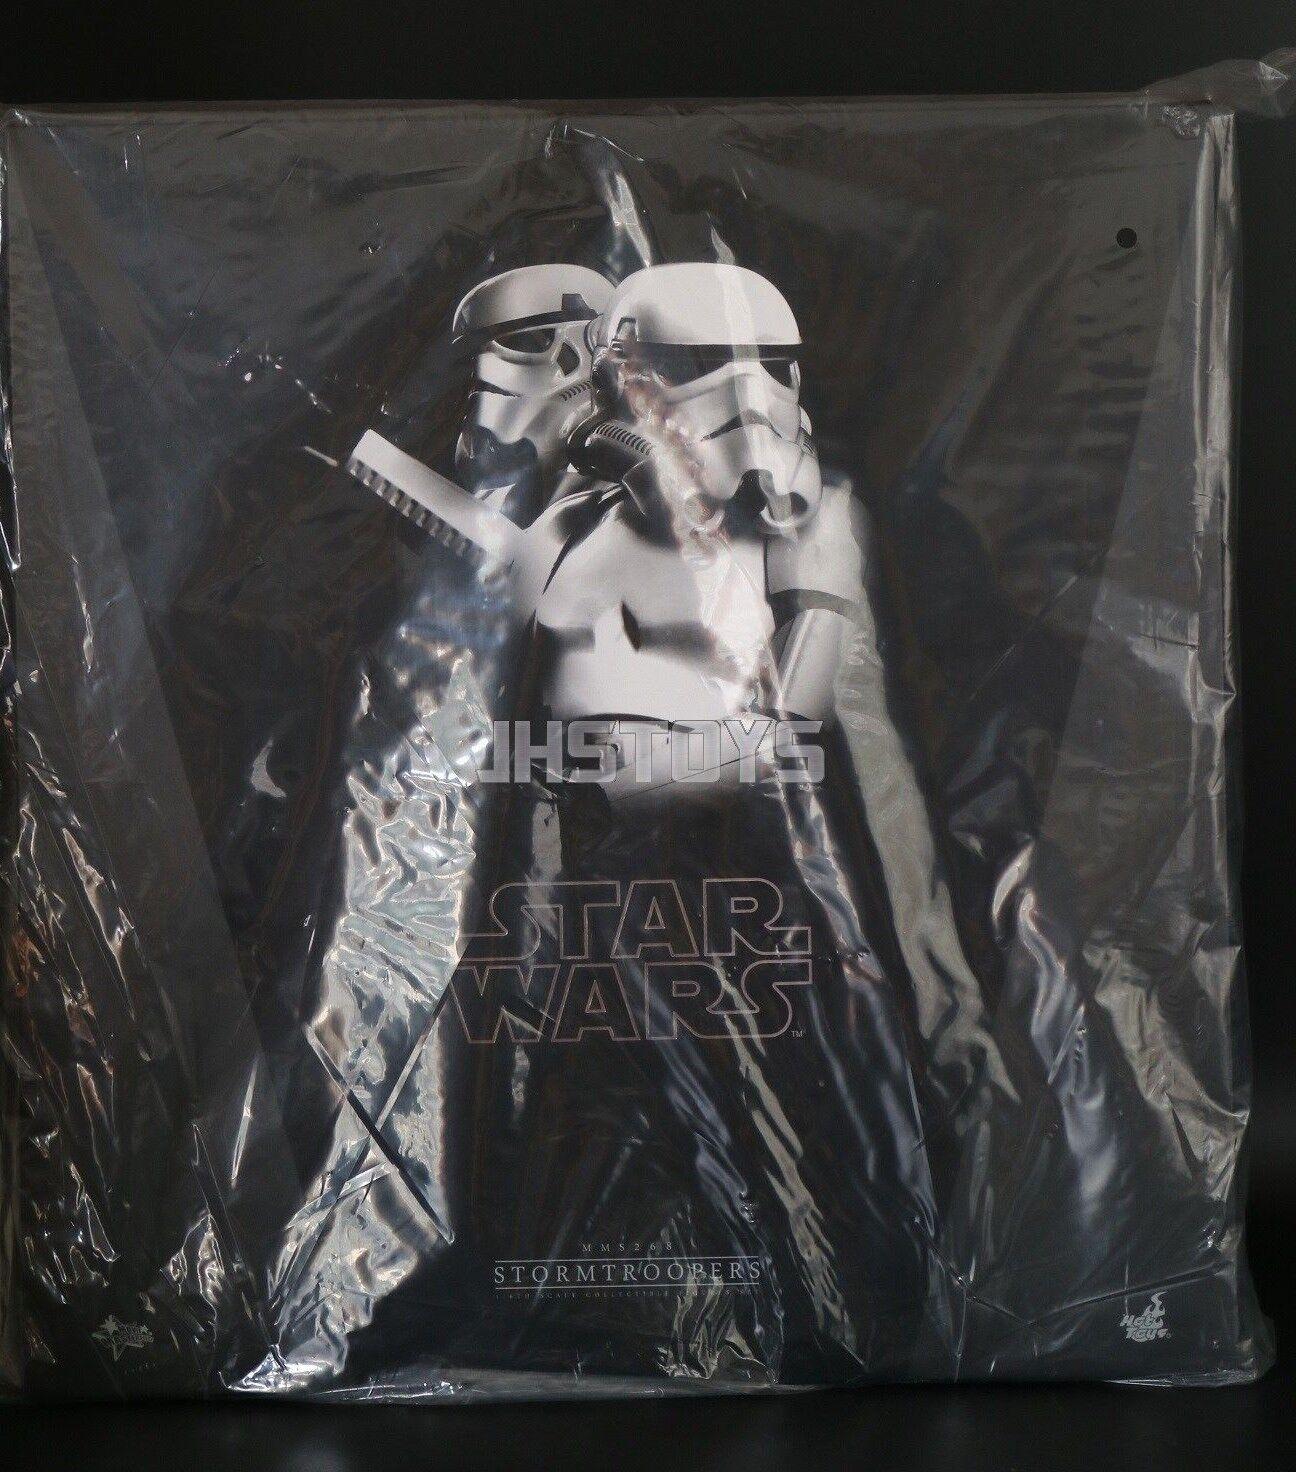 Hot Toys 1/6 Star Wars Stormtroopers Episode IV 4 Storm Trooper Set MMS268